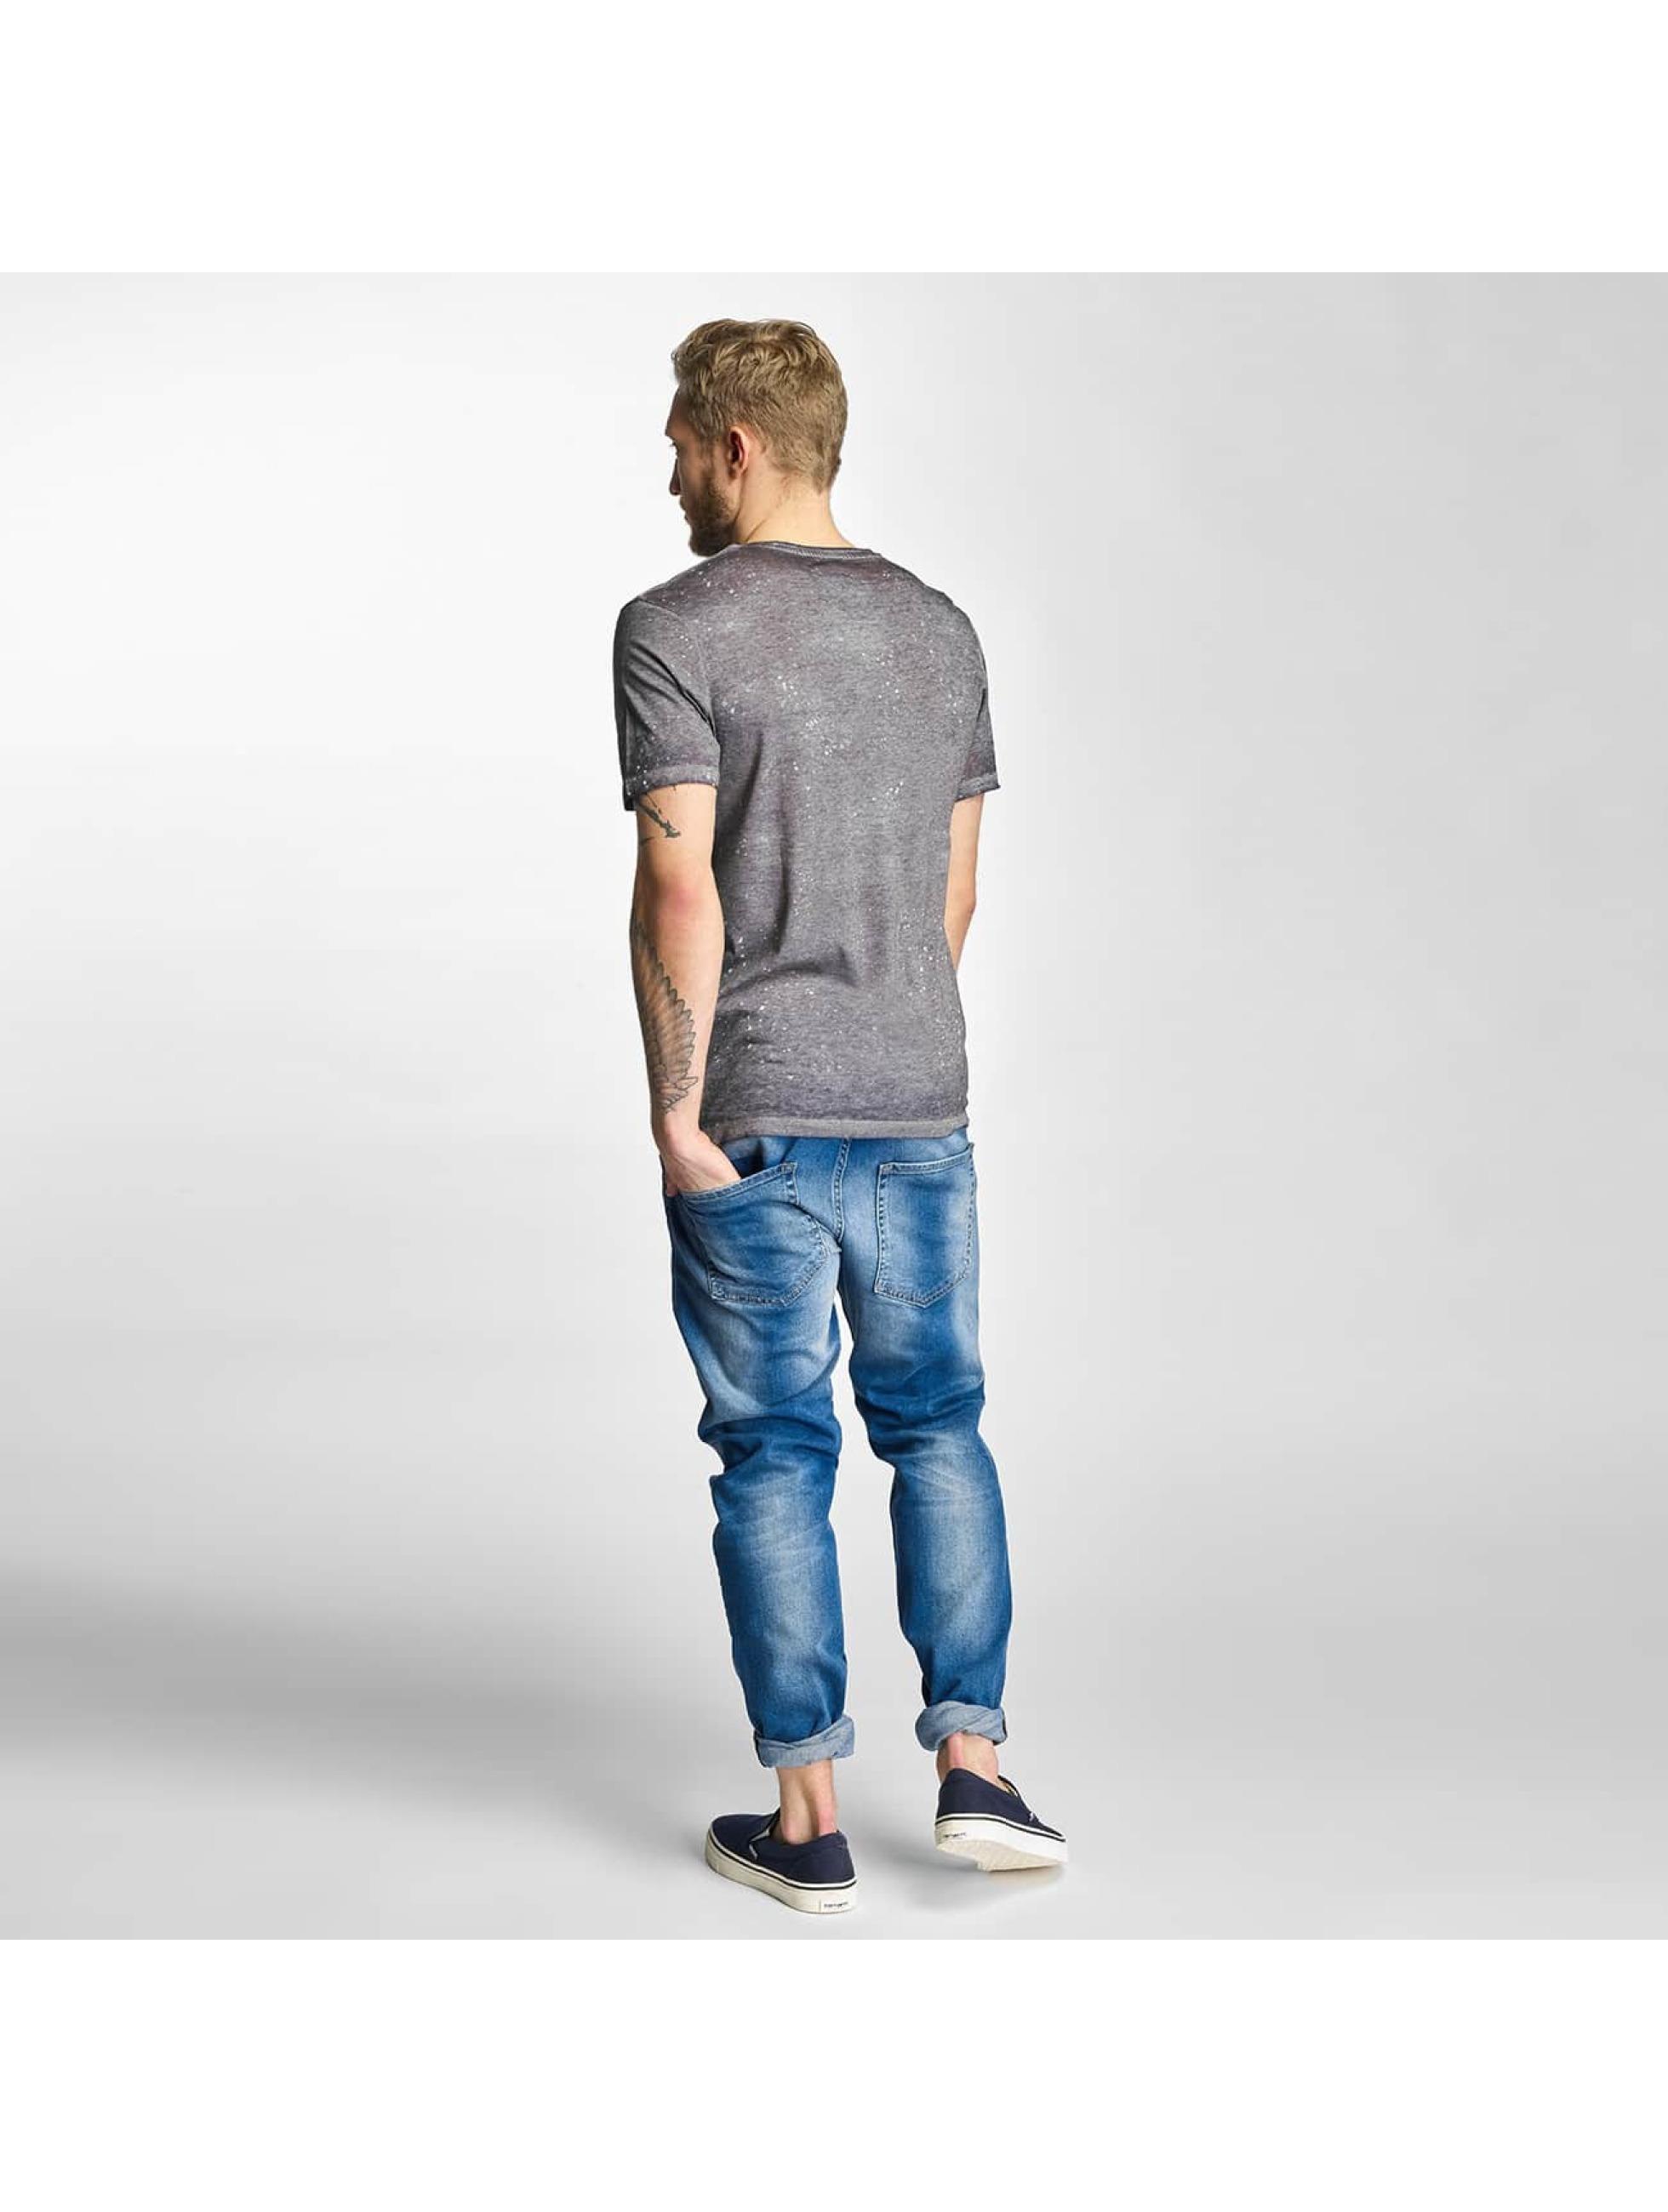 Jack & Jones T-Shirt 12118968 blue